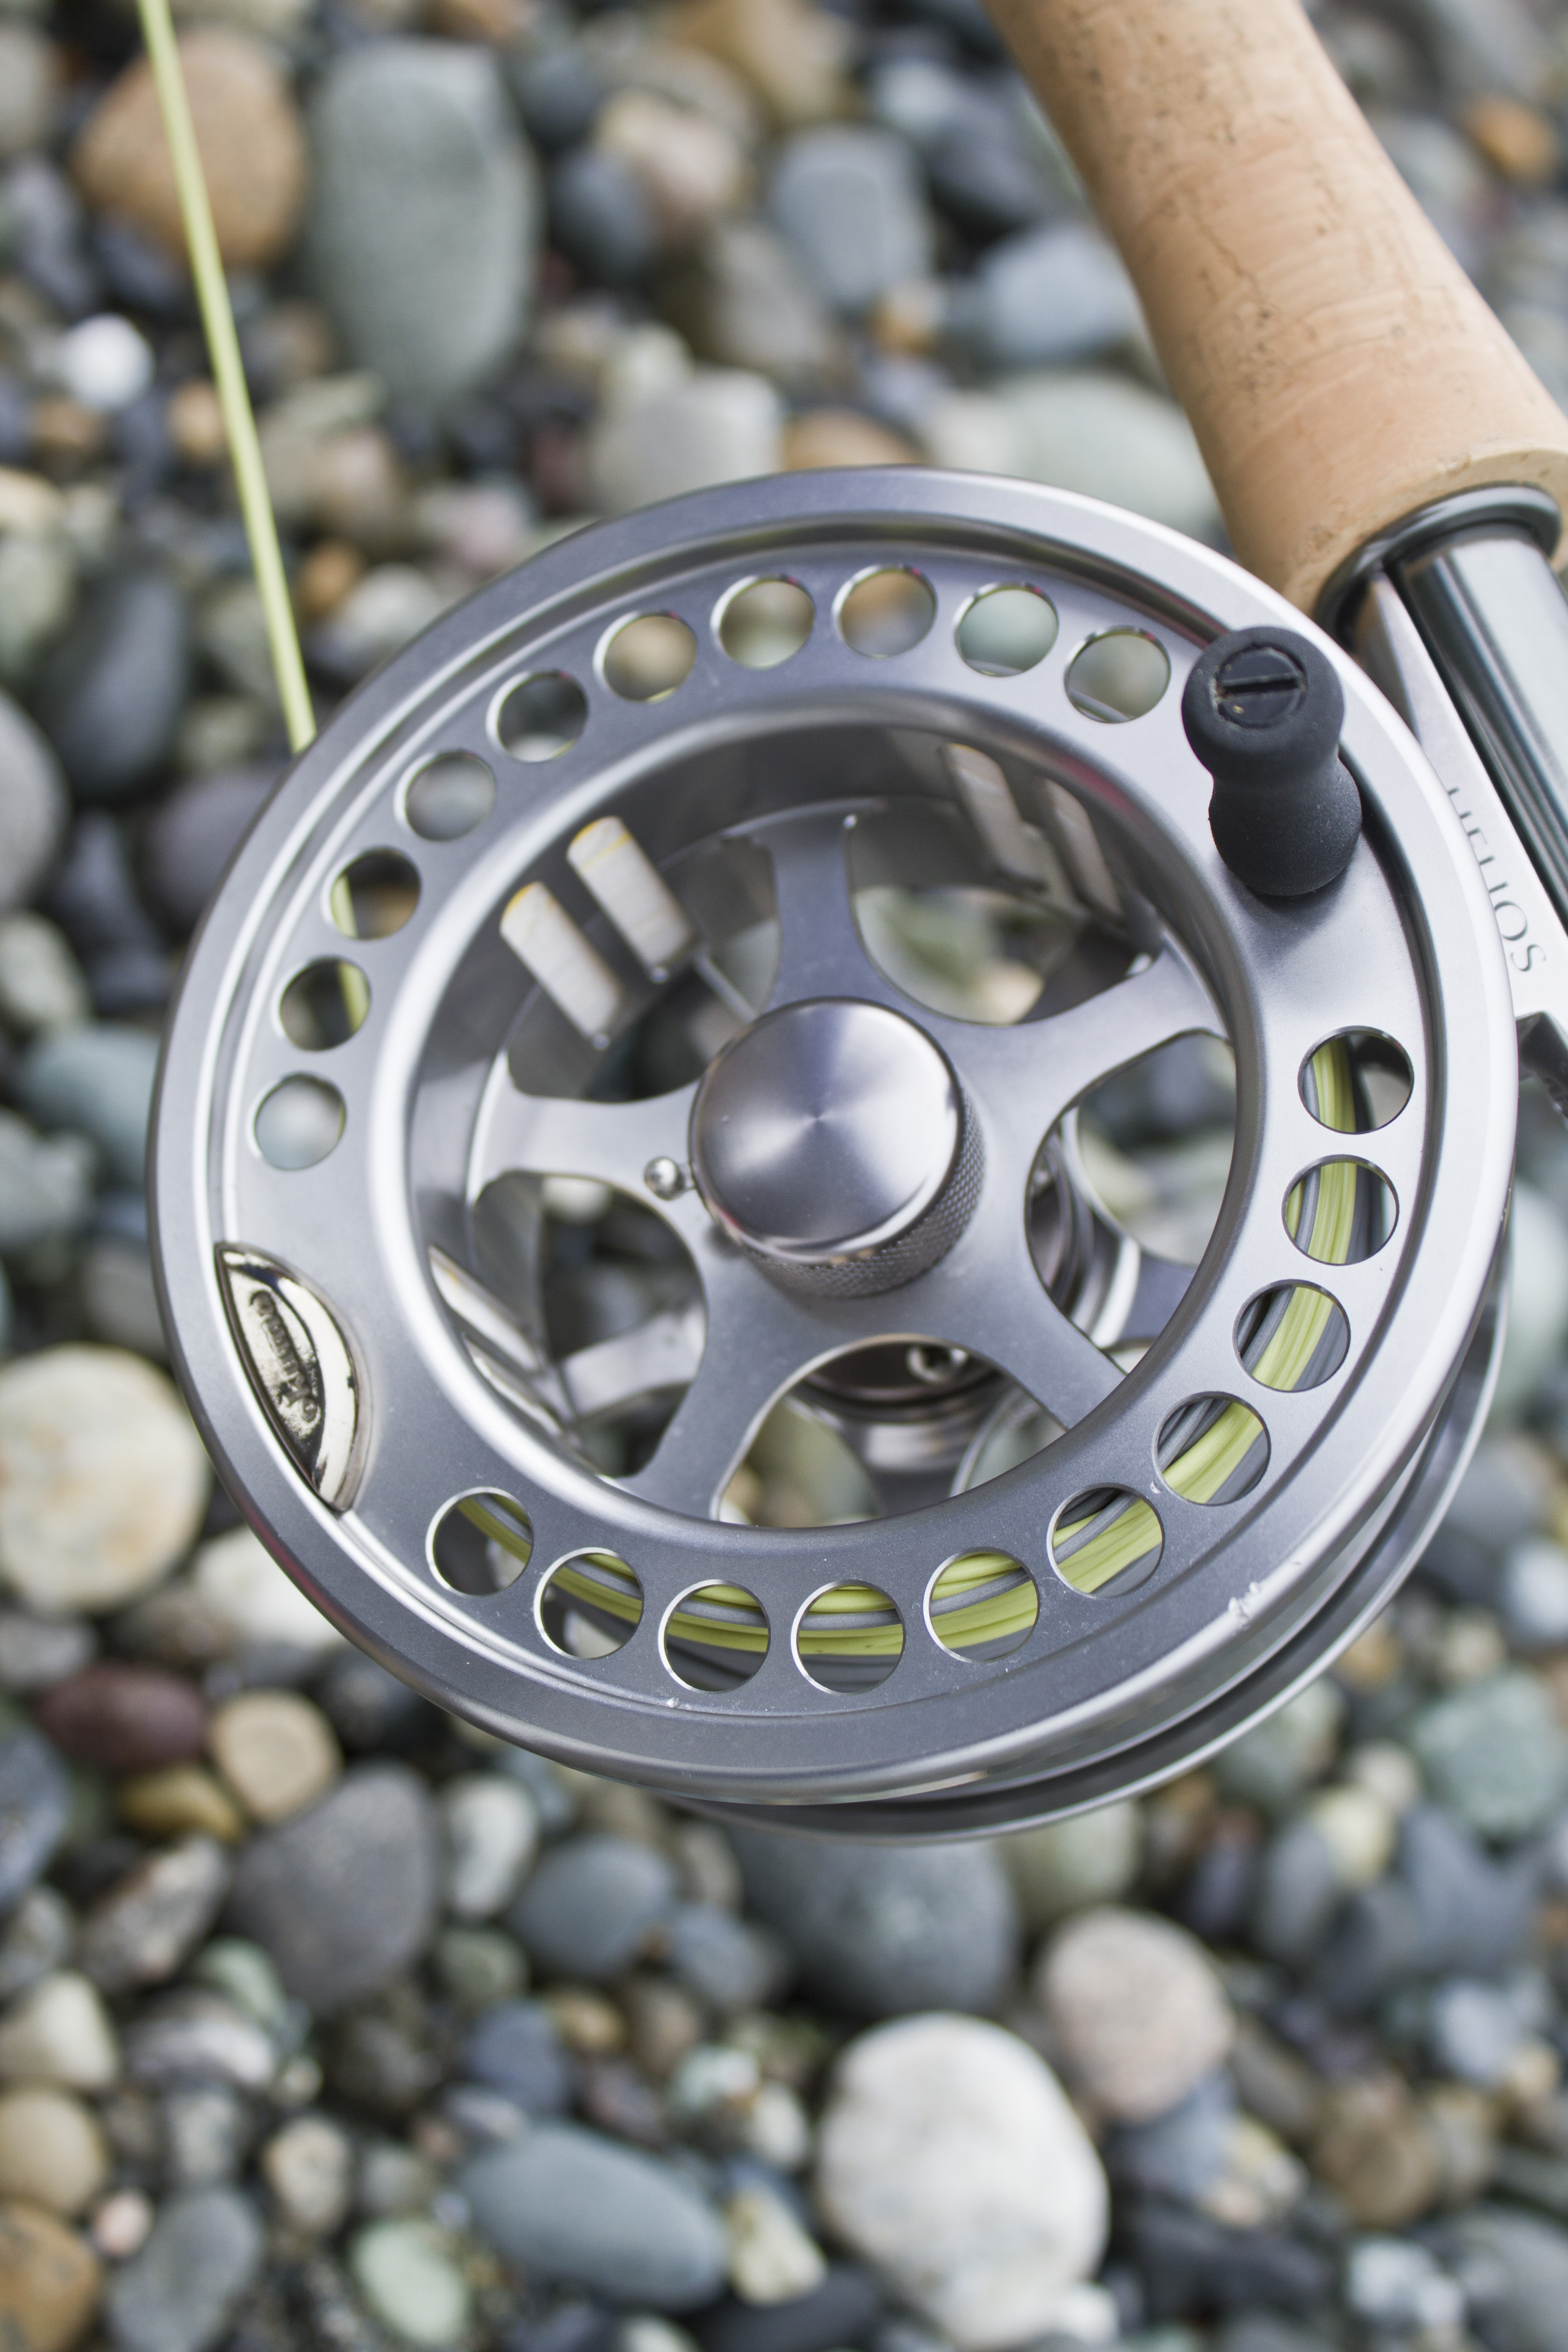 The Okuma Helios has a beautiful brushed aluminum finish that looks great on the rod.